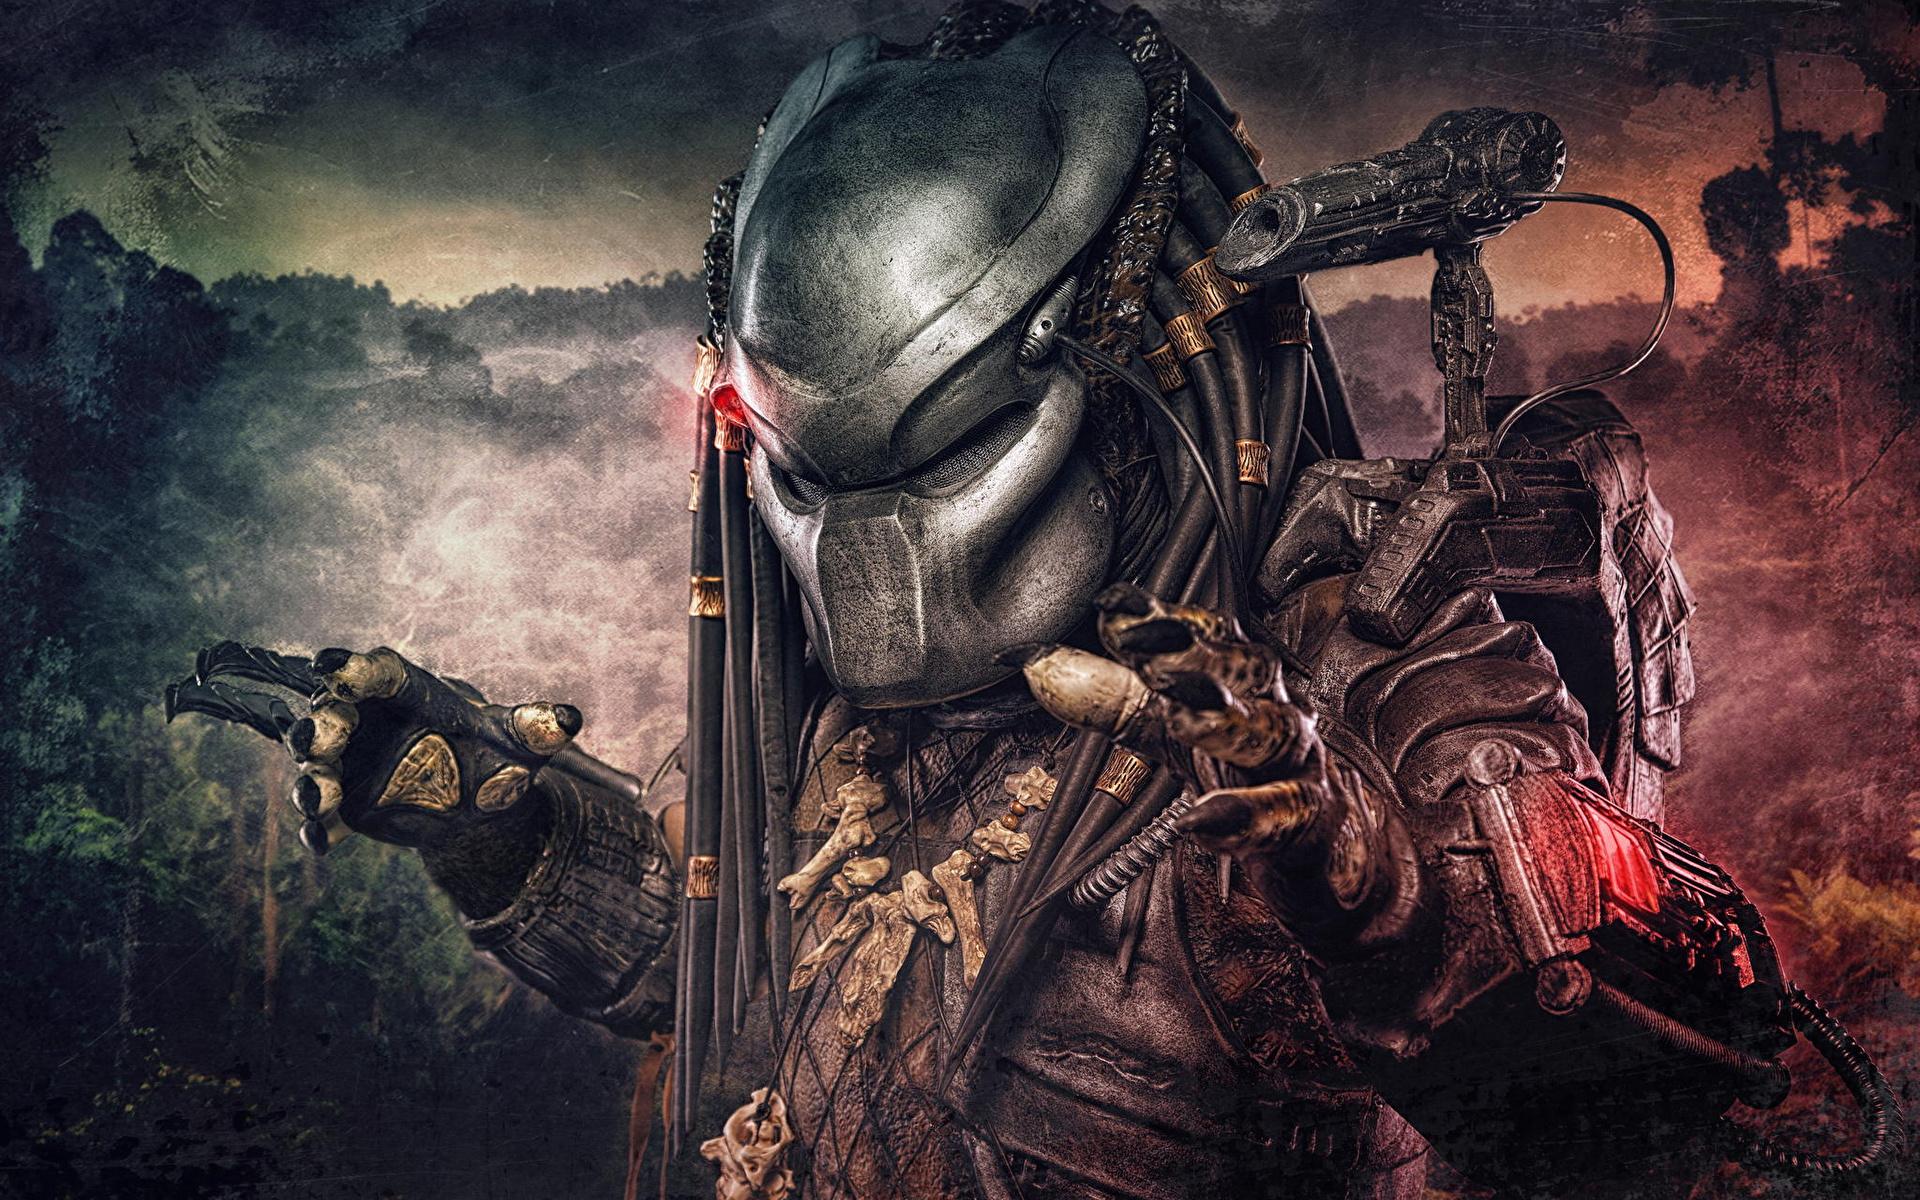 Full Movie Watch Full movie AVP Alien vs Predator 2004